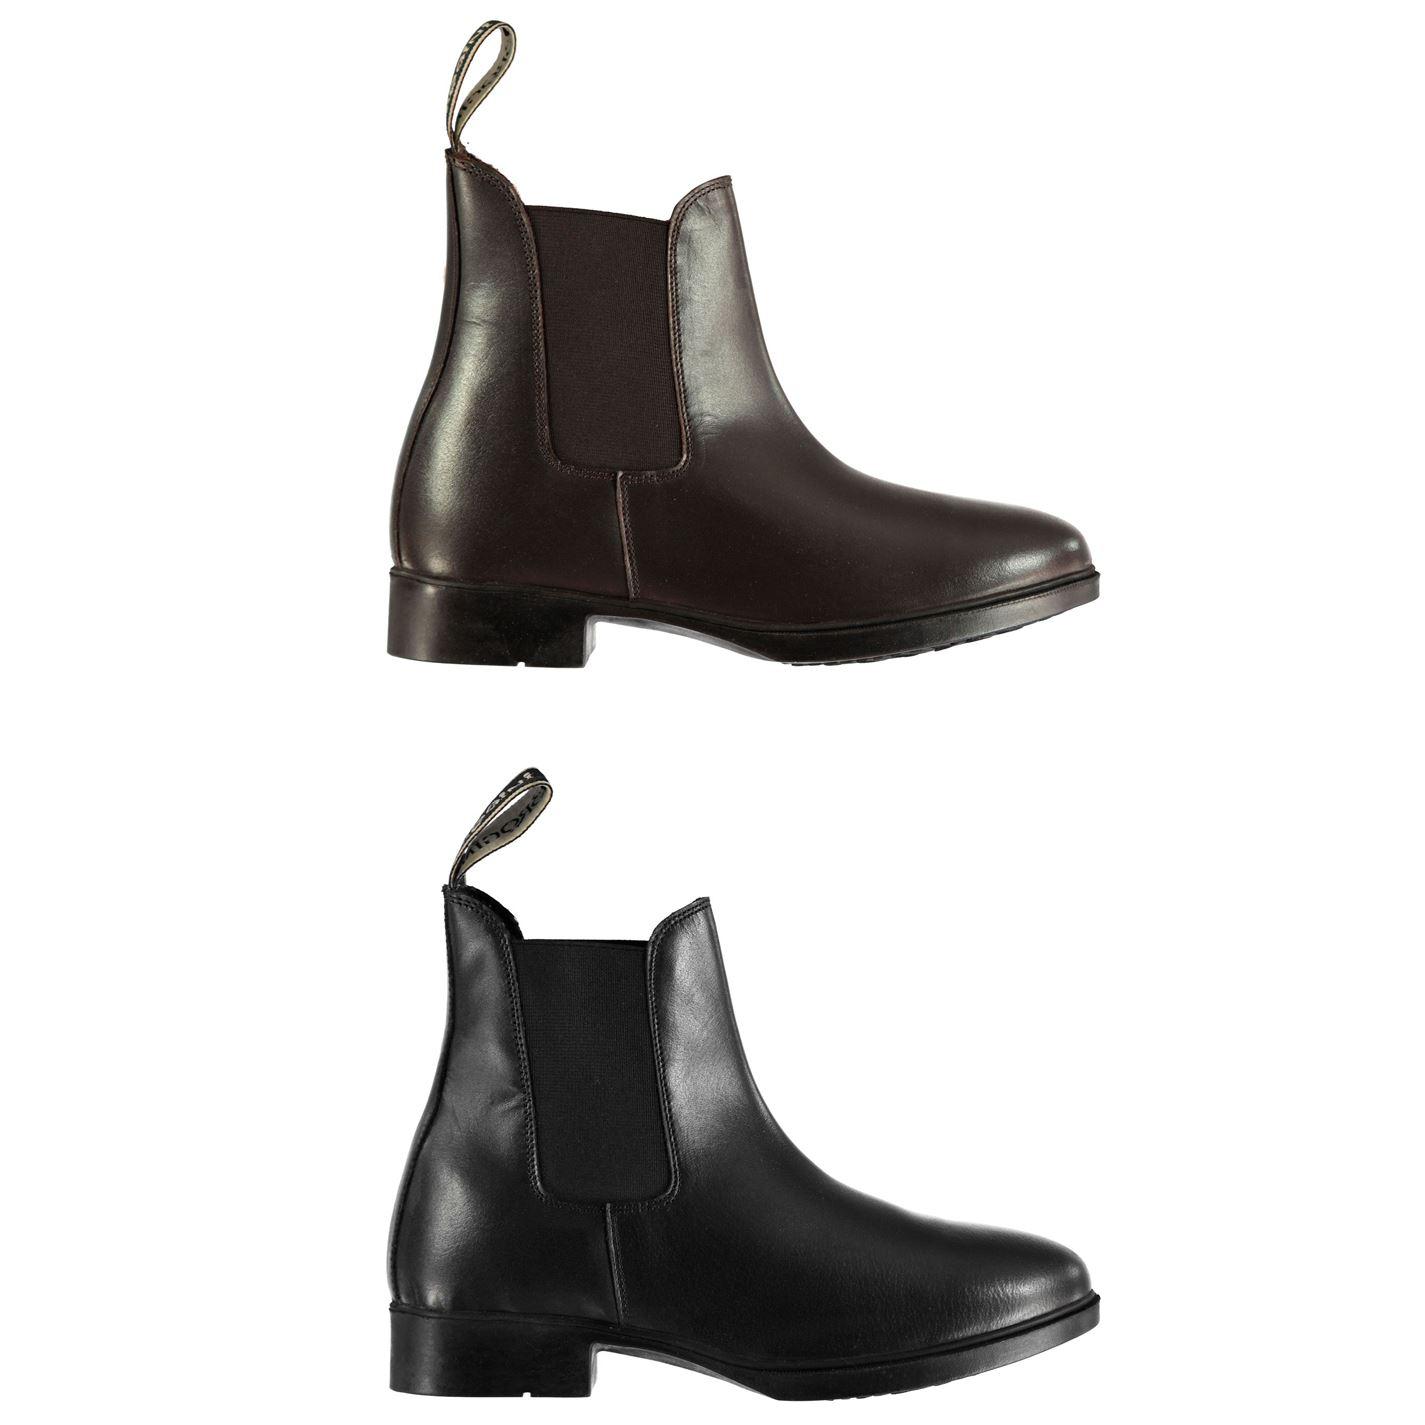 Details about Brogini Pavia Jodhpur Boots Juniors Boys Shoes Boot Kids Footwear